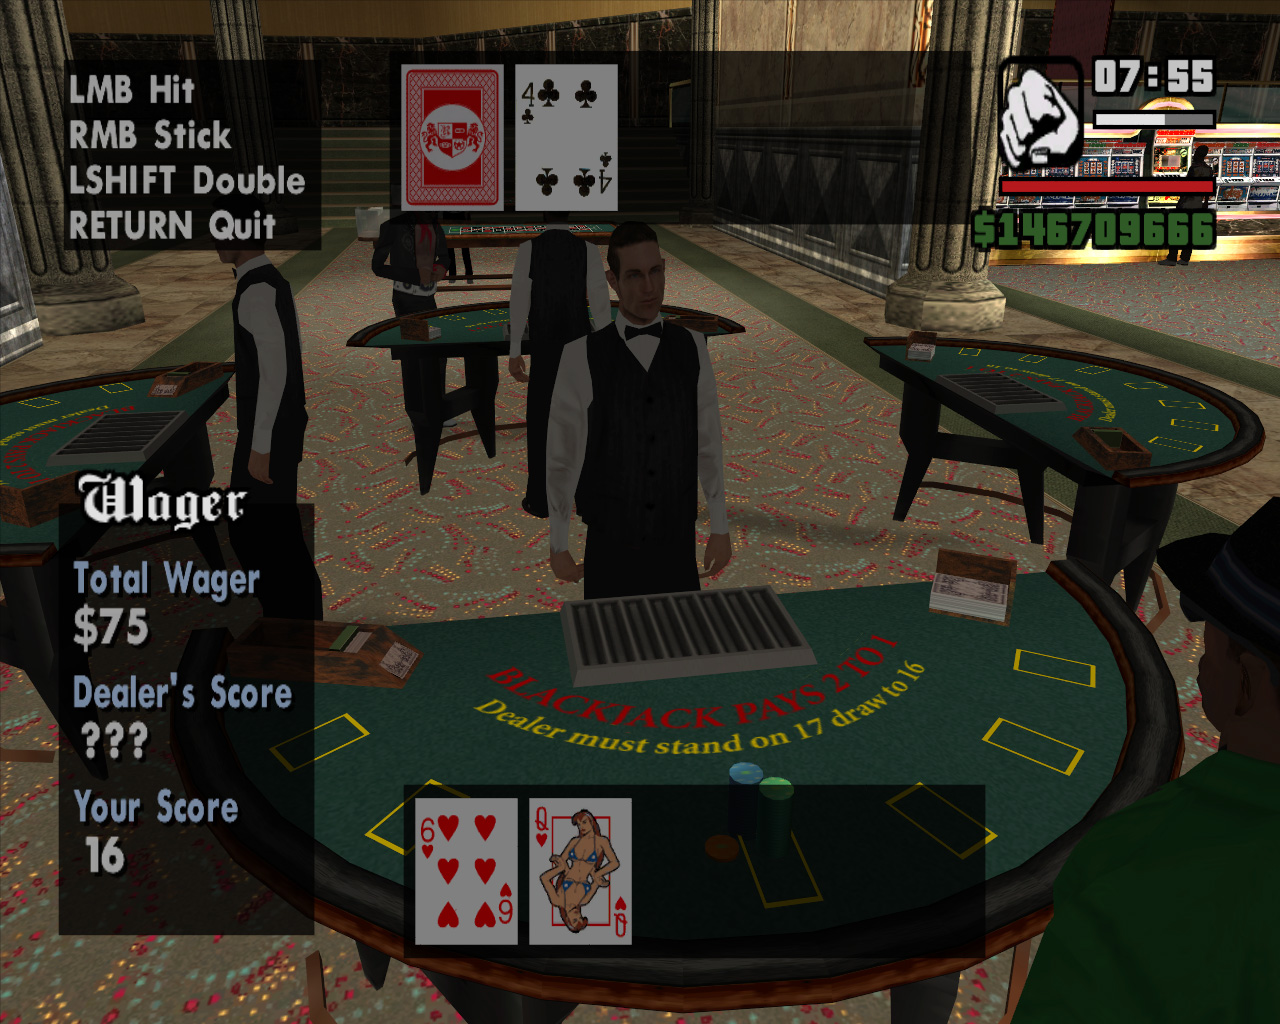 Doubledown casino promo codes august 2013